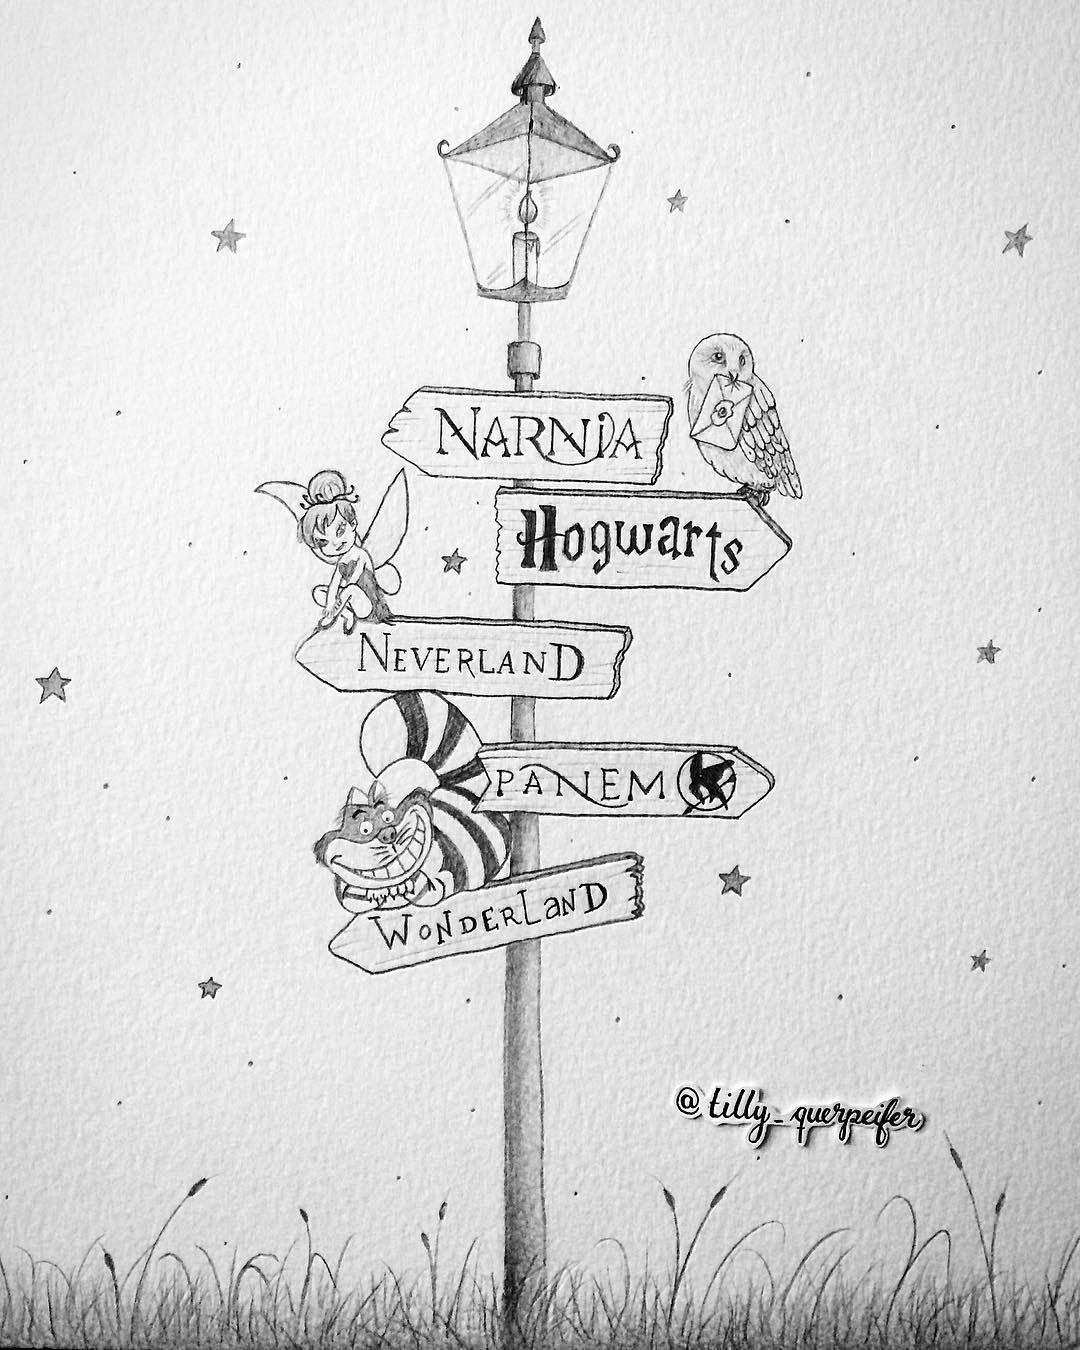 pencil drawing harry potter, hogwarts, peter pan, neverland